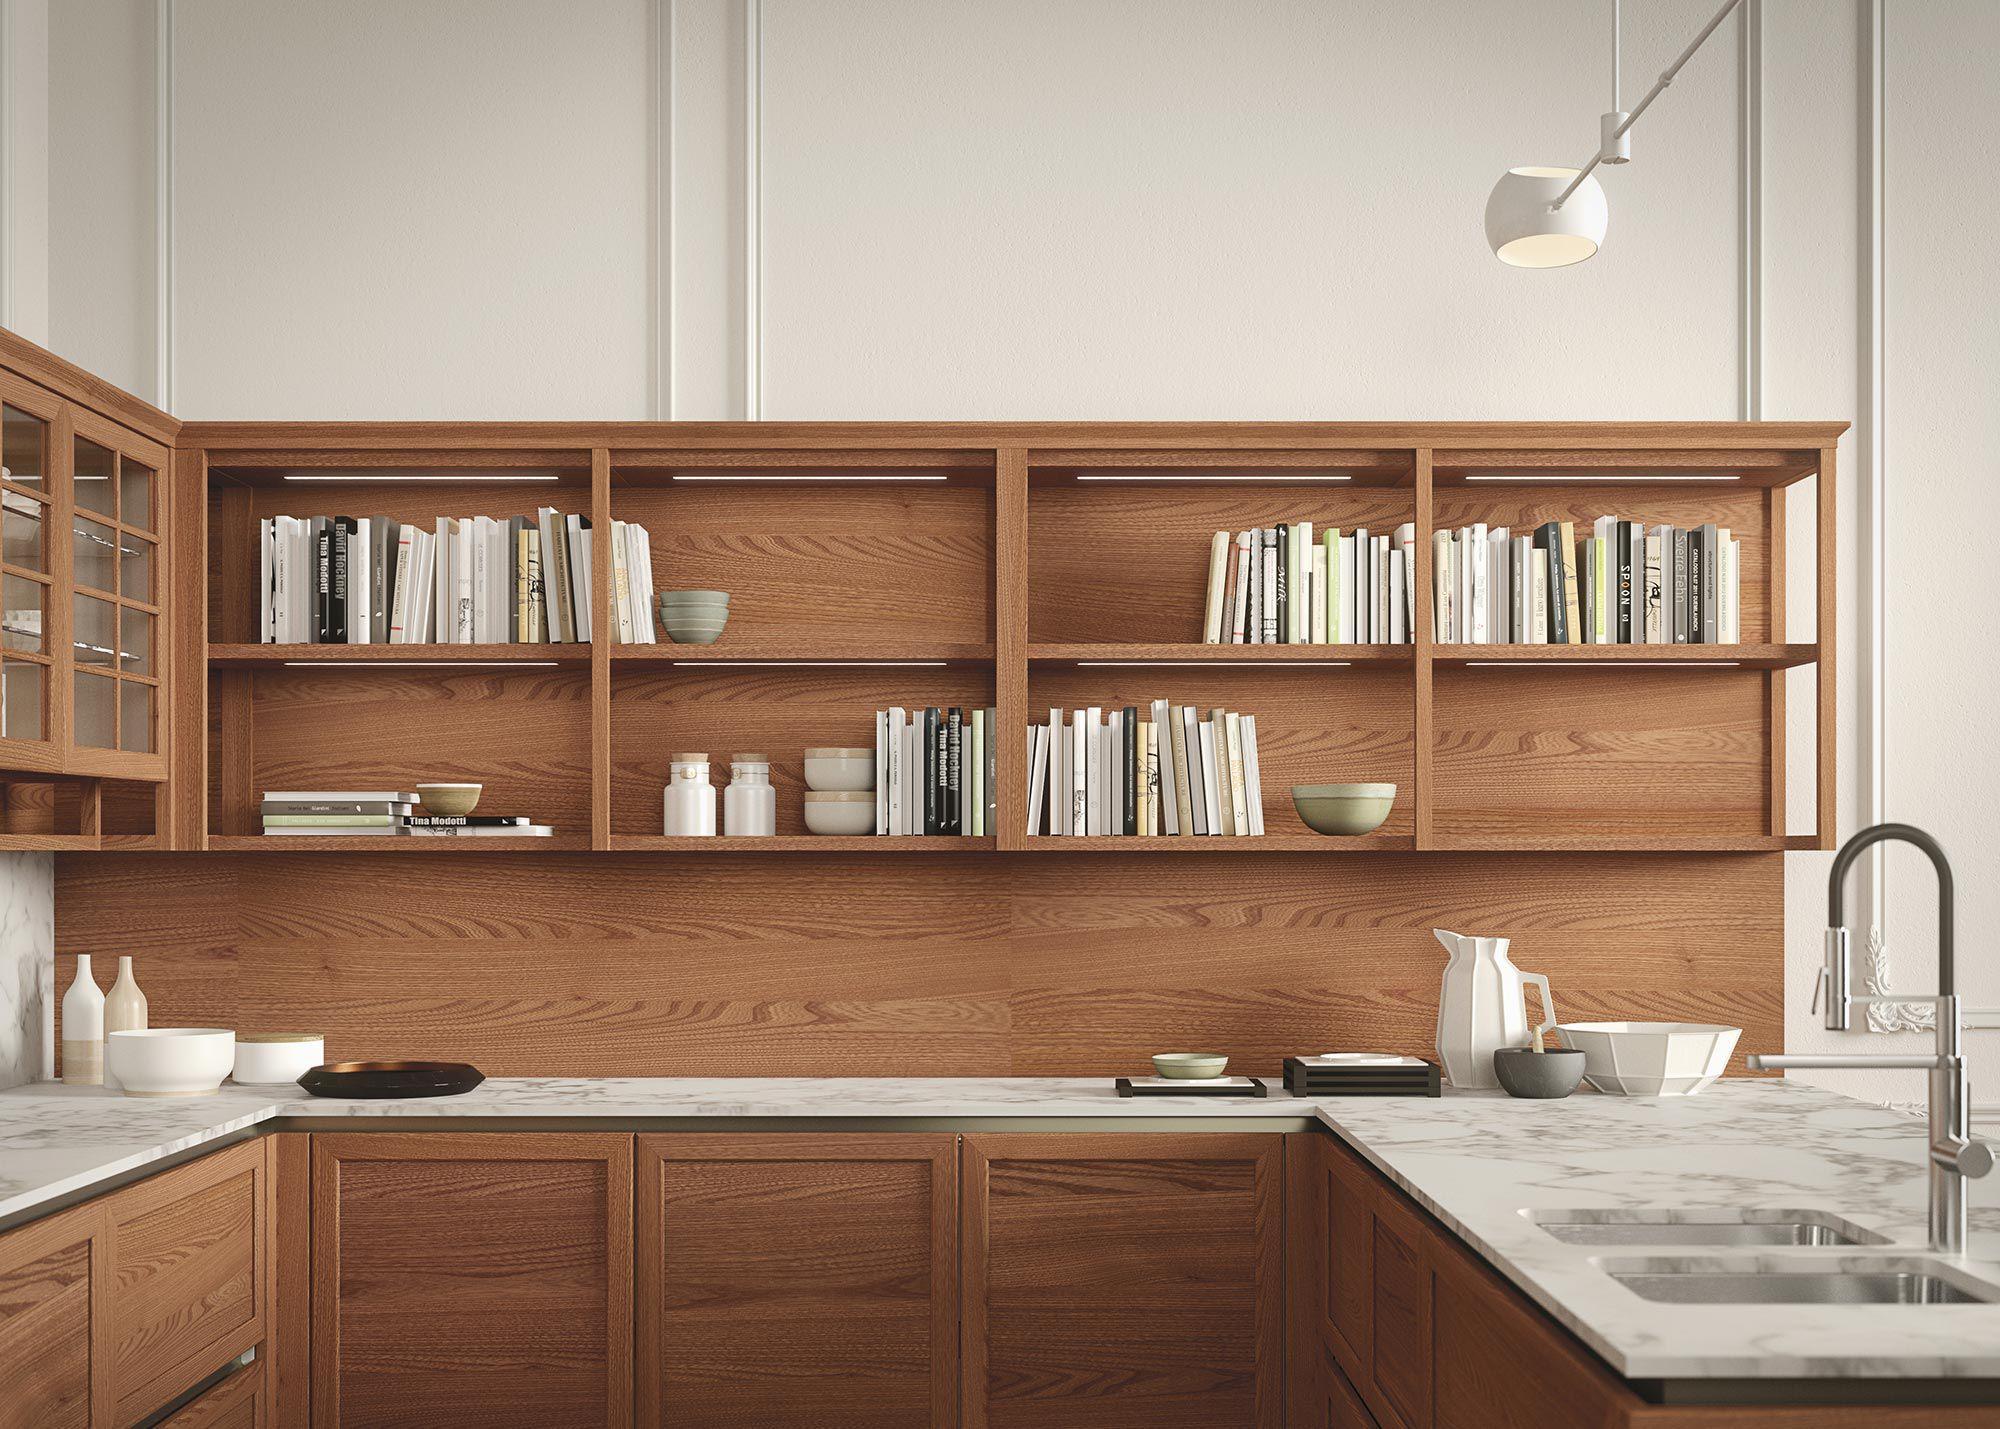 ... Klassische Küche / Ulme / Modul / Kochinsel HERITAGE By Iosa Ghini Design  SNAIDERO ...